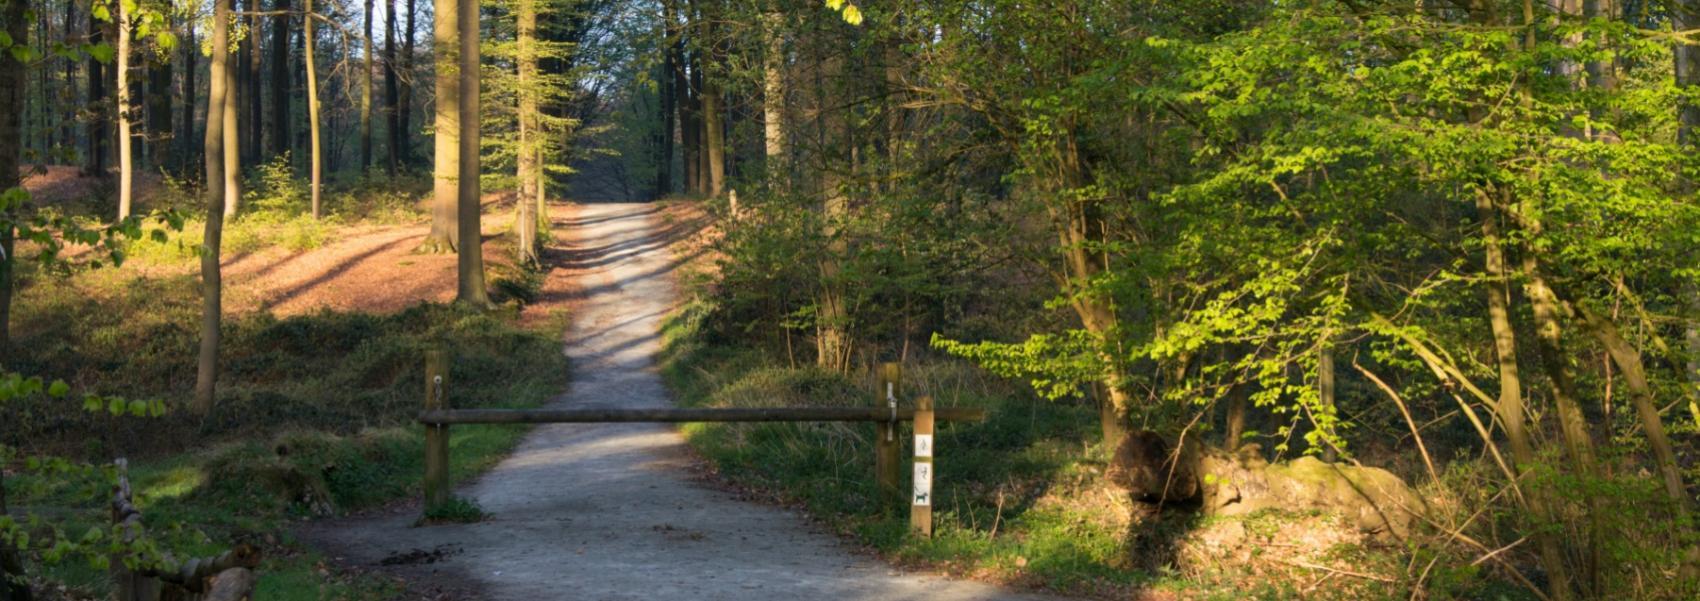 wandelpad in het bos